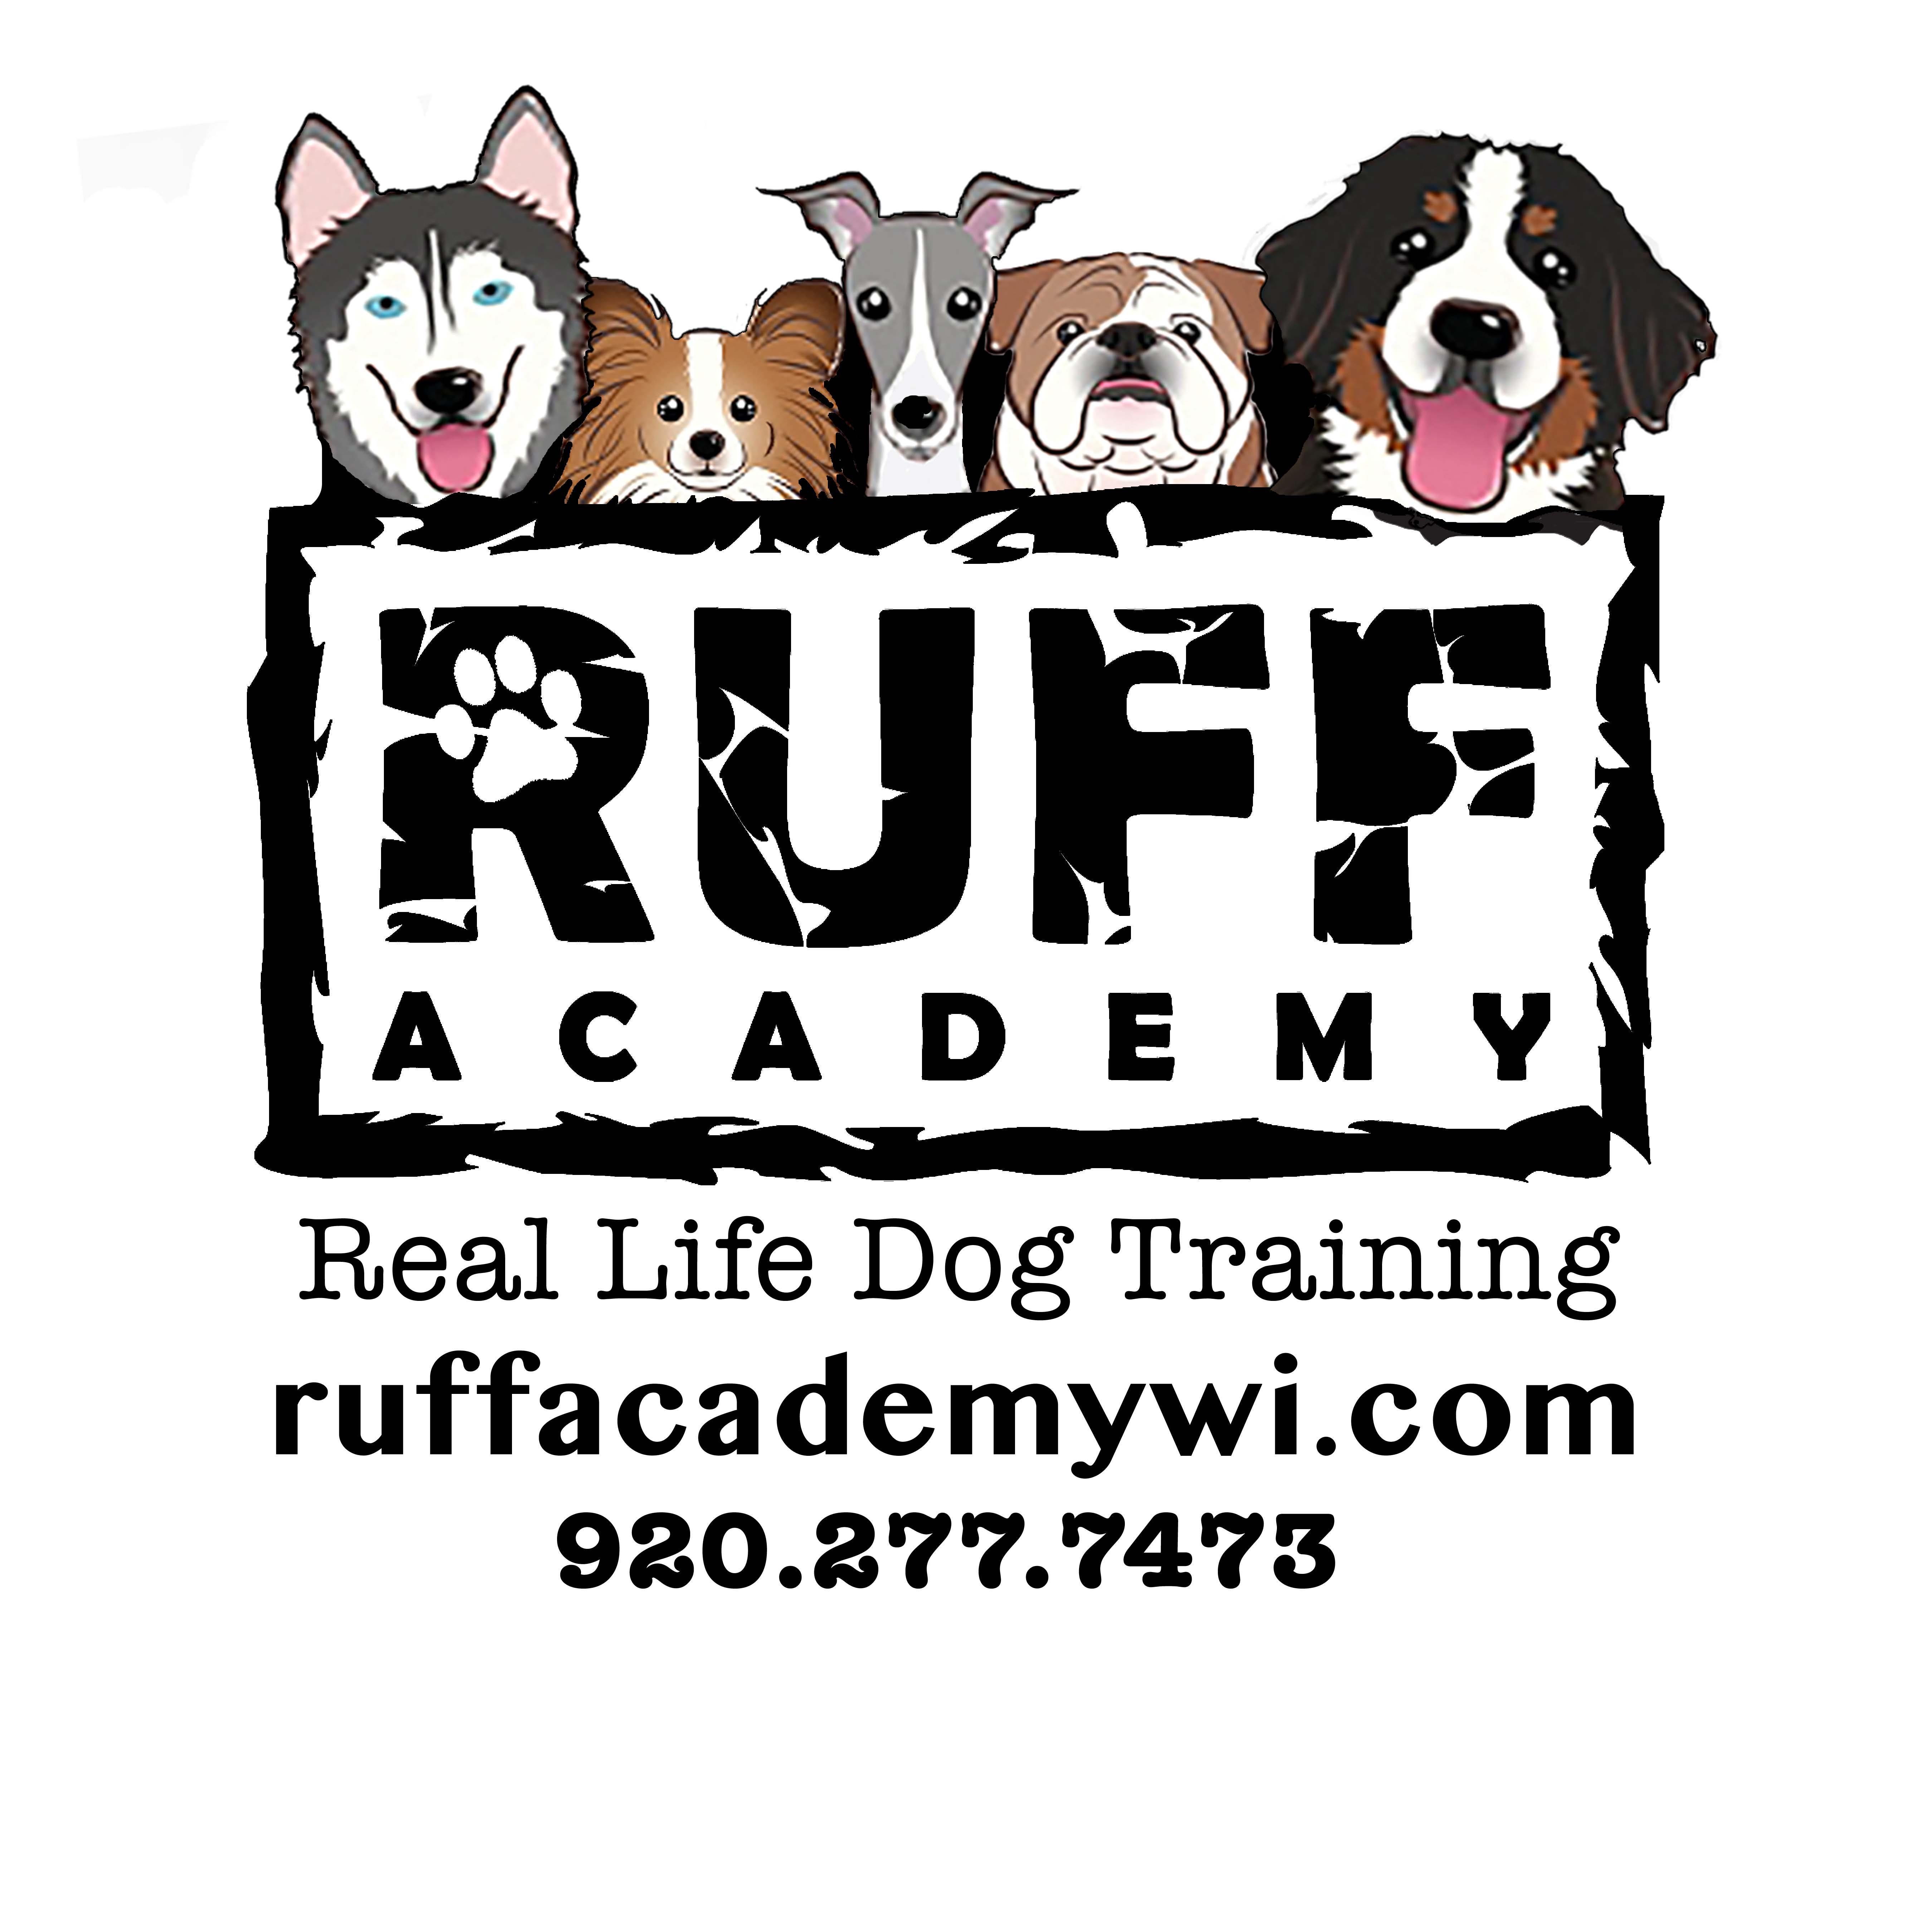 RUFF Academy Real Life Dog Training